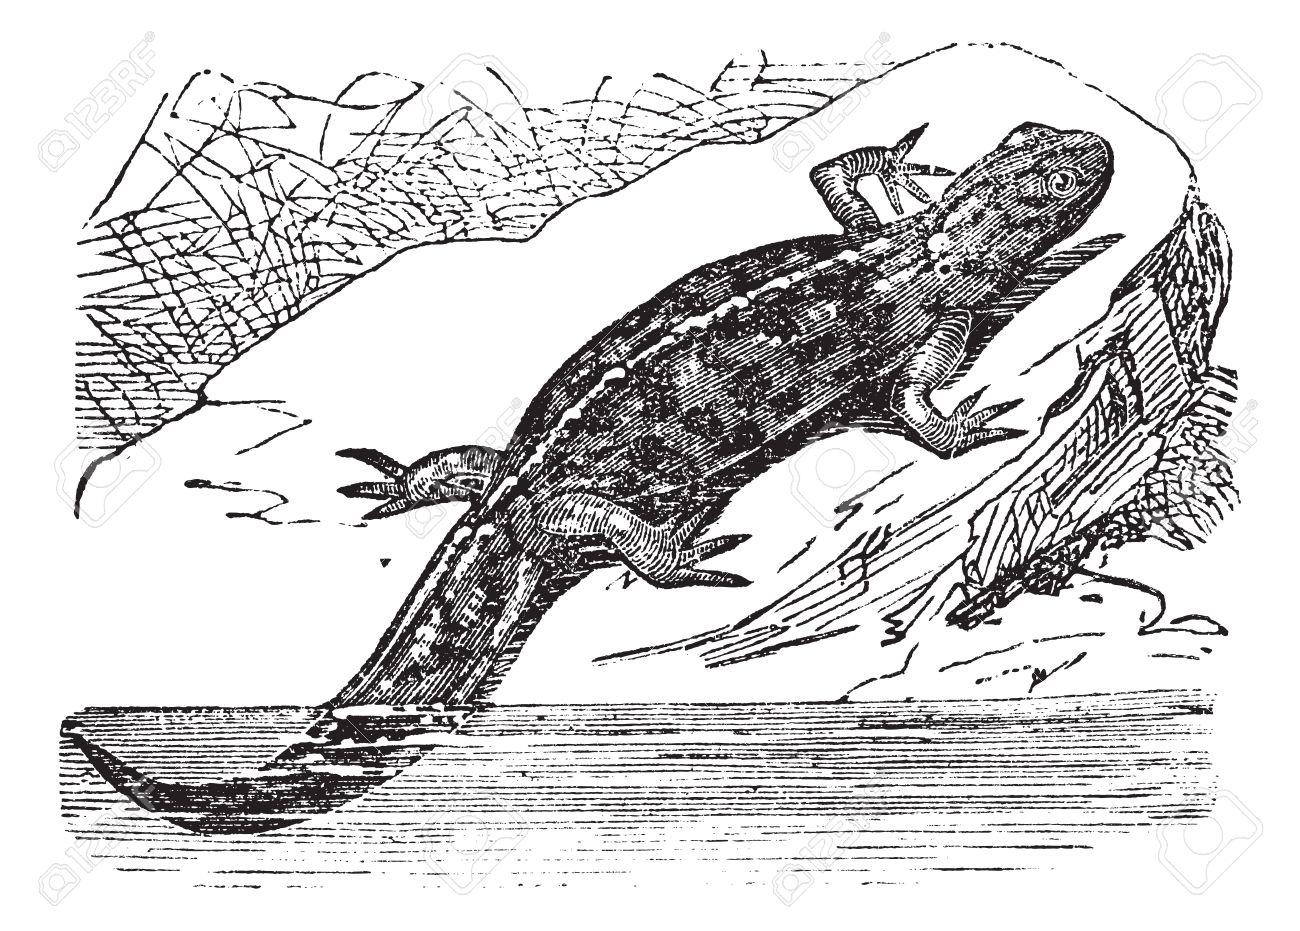 Smooth Newt Or Lissotriton Vulgaris, Vintage Engraved Illustration.